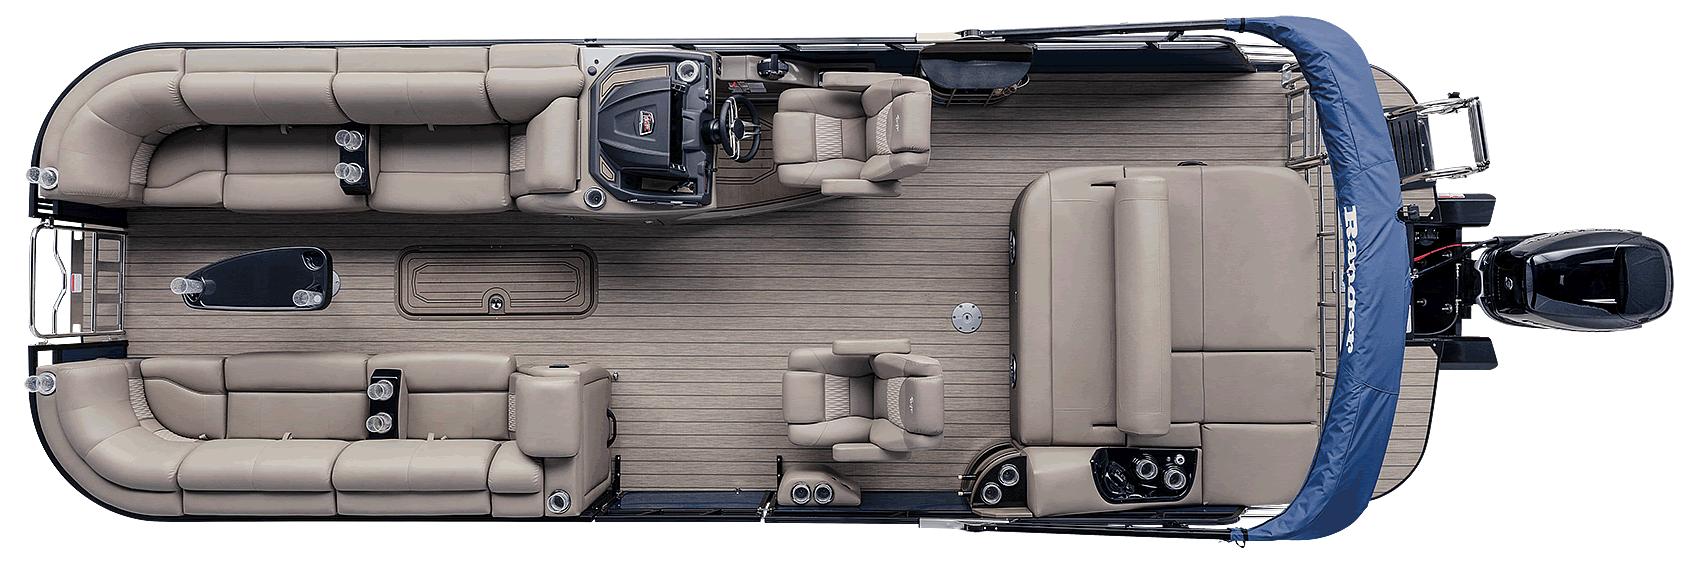 Ranger Reata 2500LS Luxury Pontoon